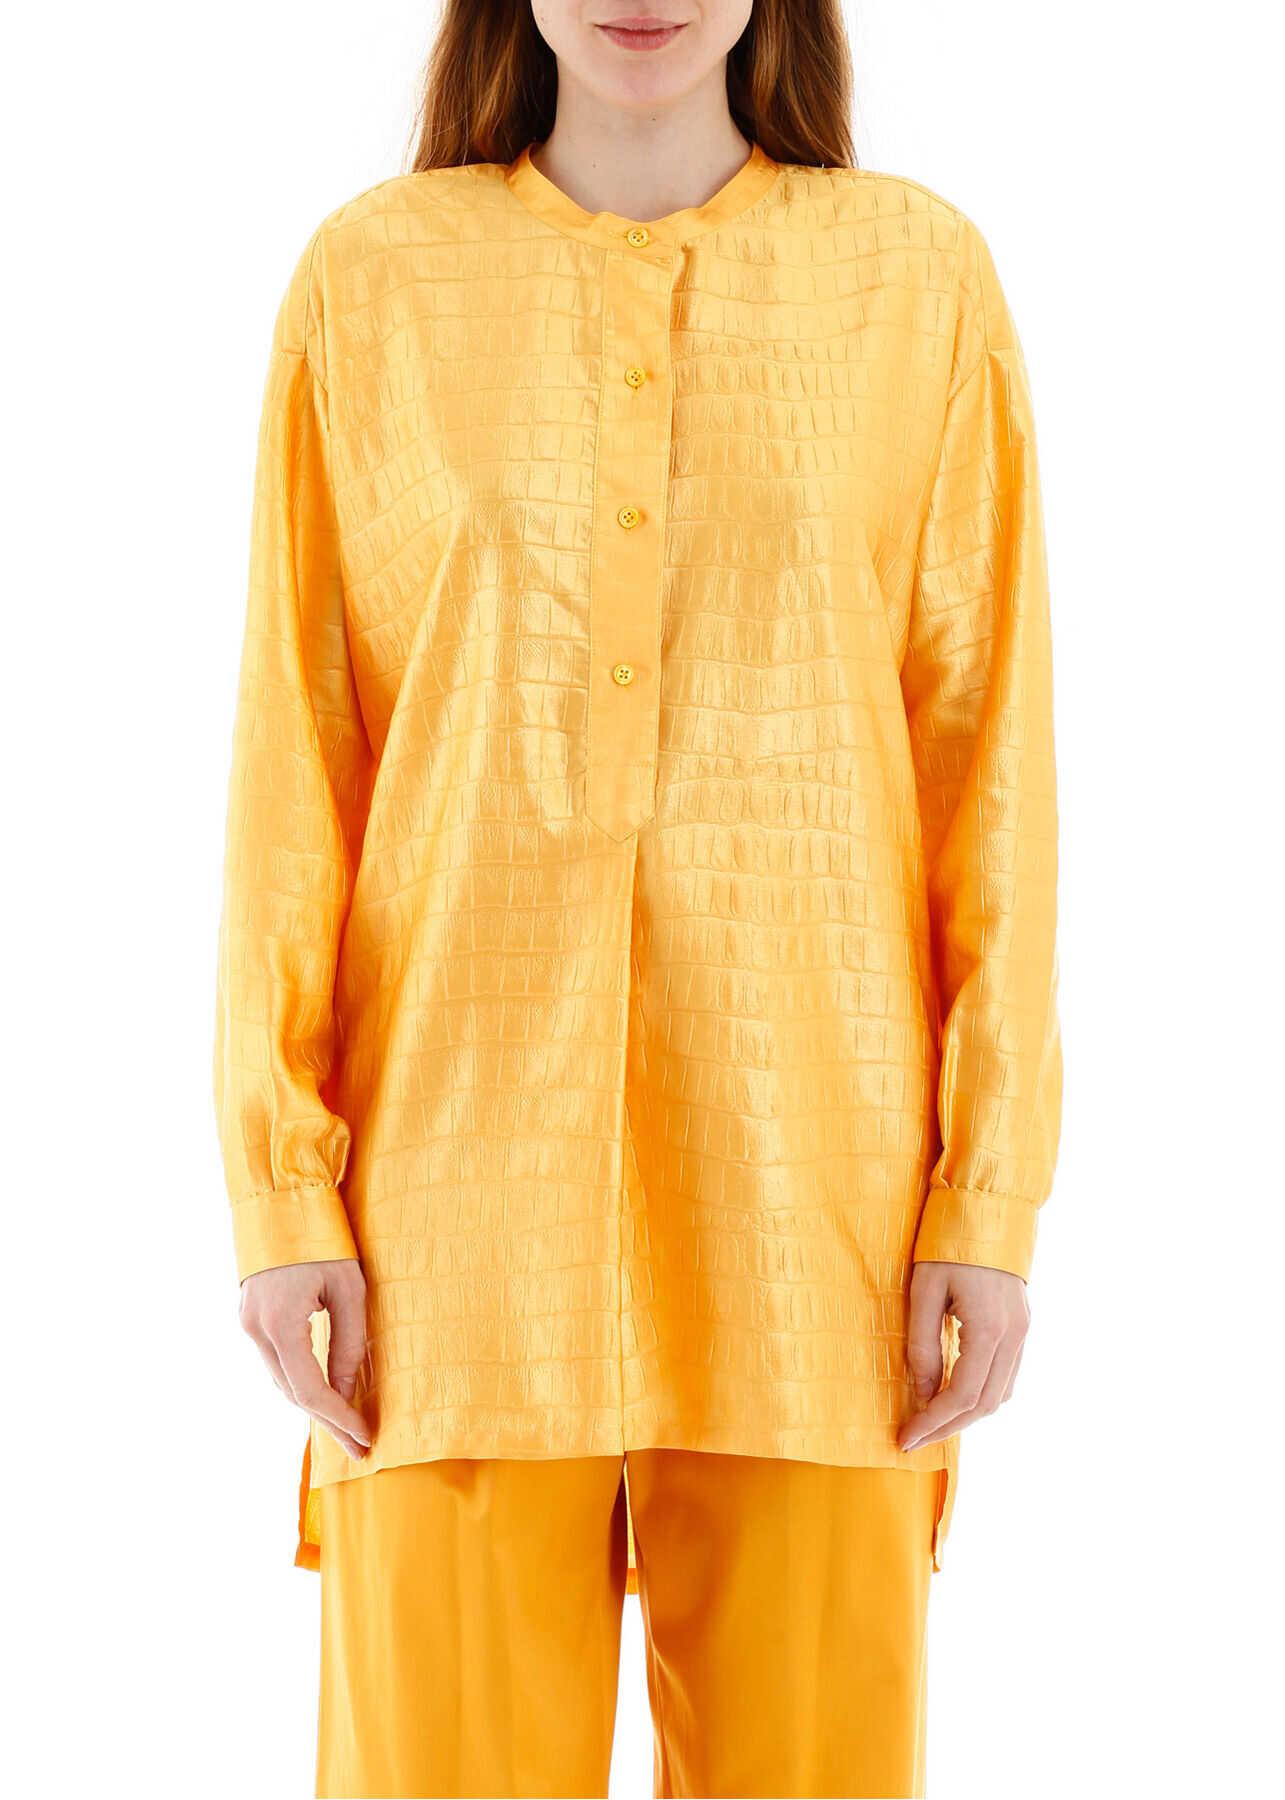 Sies Marjan Azra Tunic Shirt 16IA3108 ANTARES8 APRICOT image0